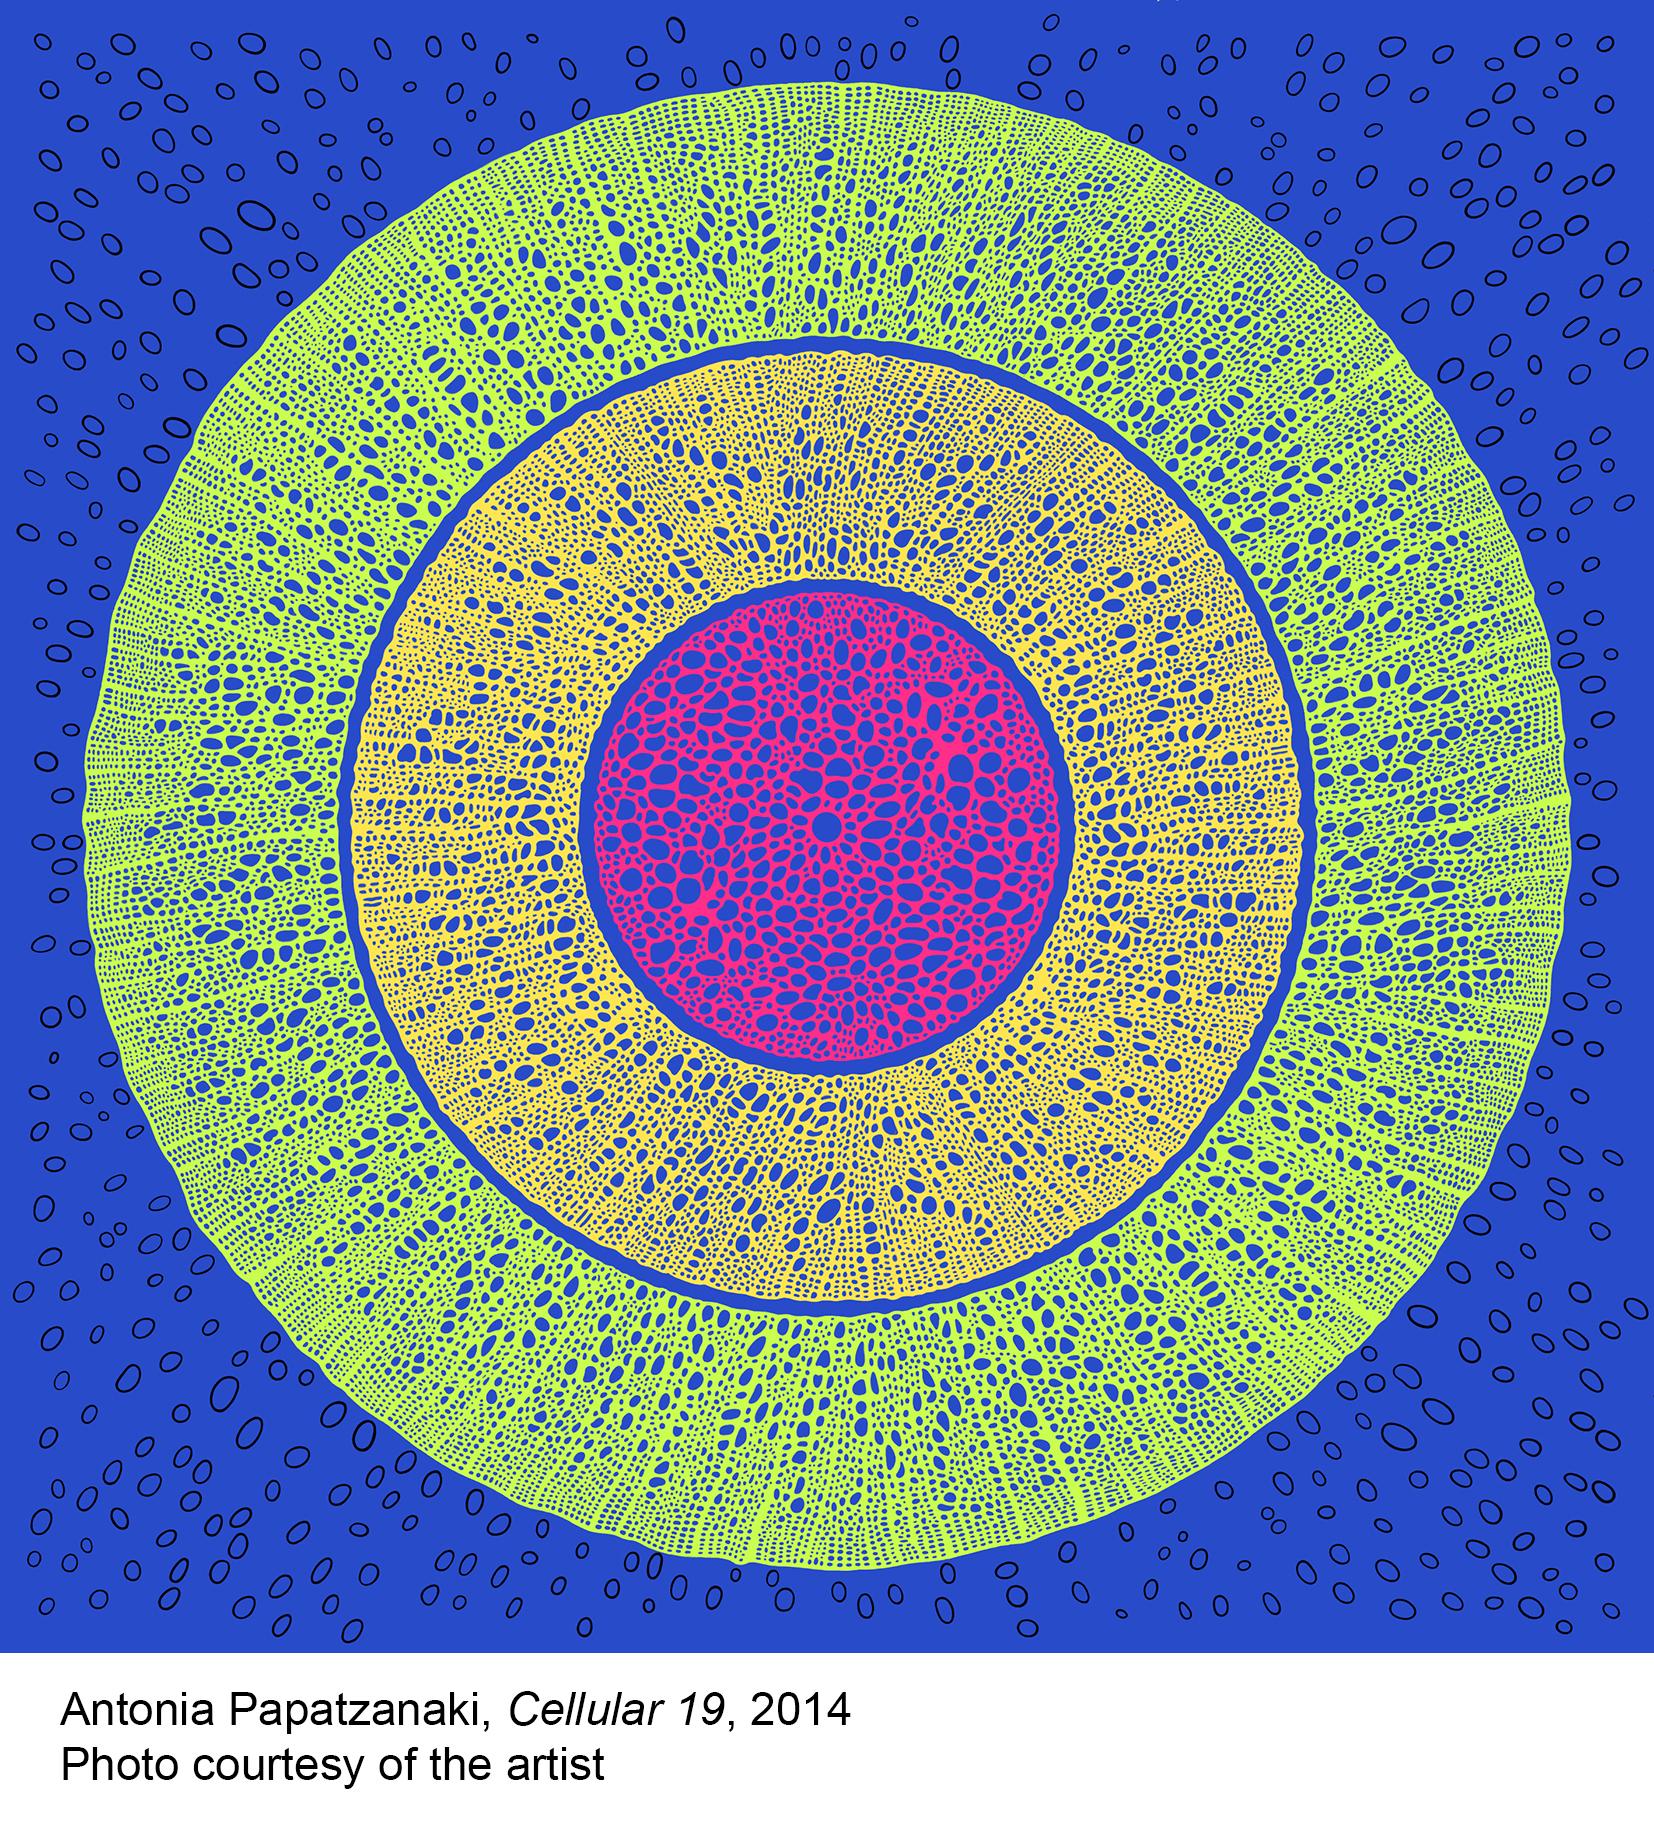 04-Antonia_Papatzanaki_Cellular_19_2014_title .jpg